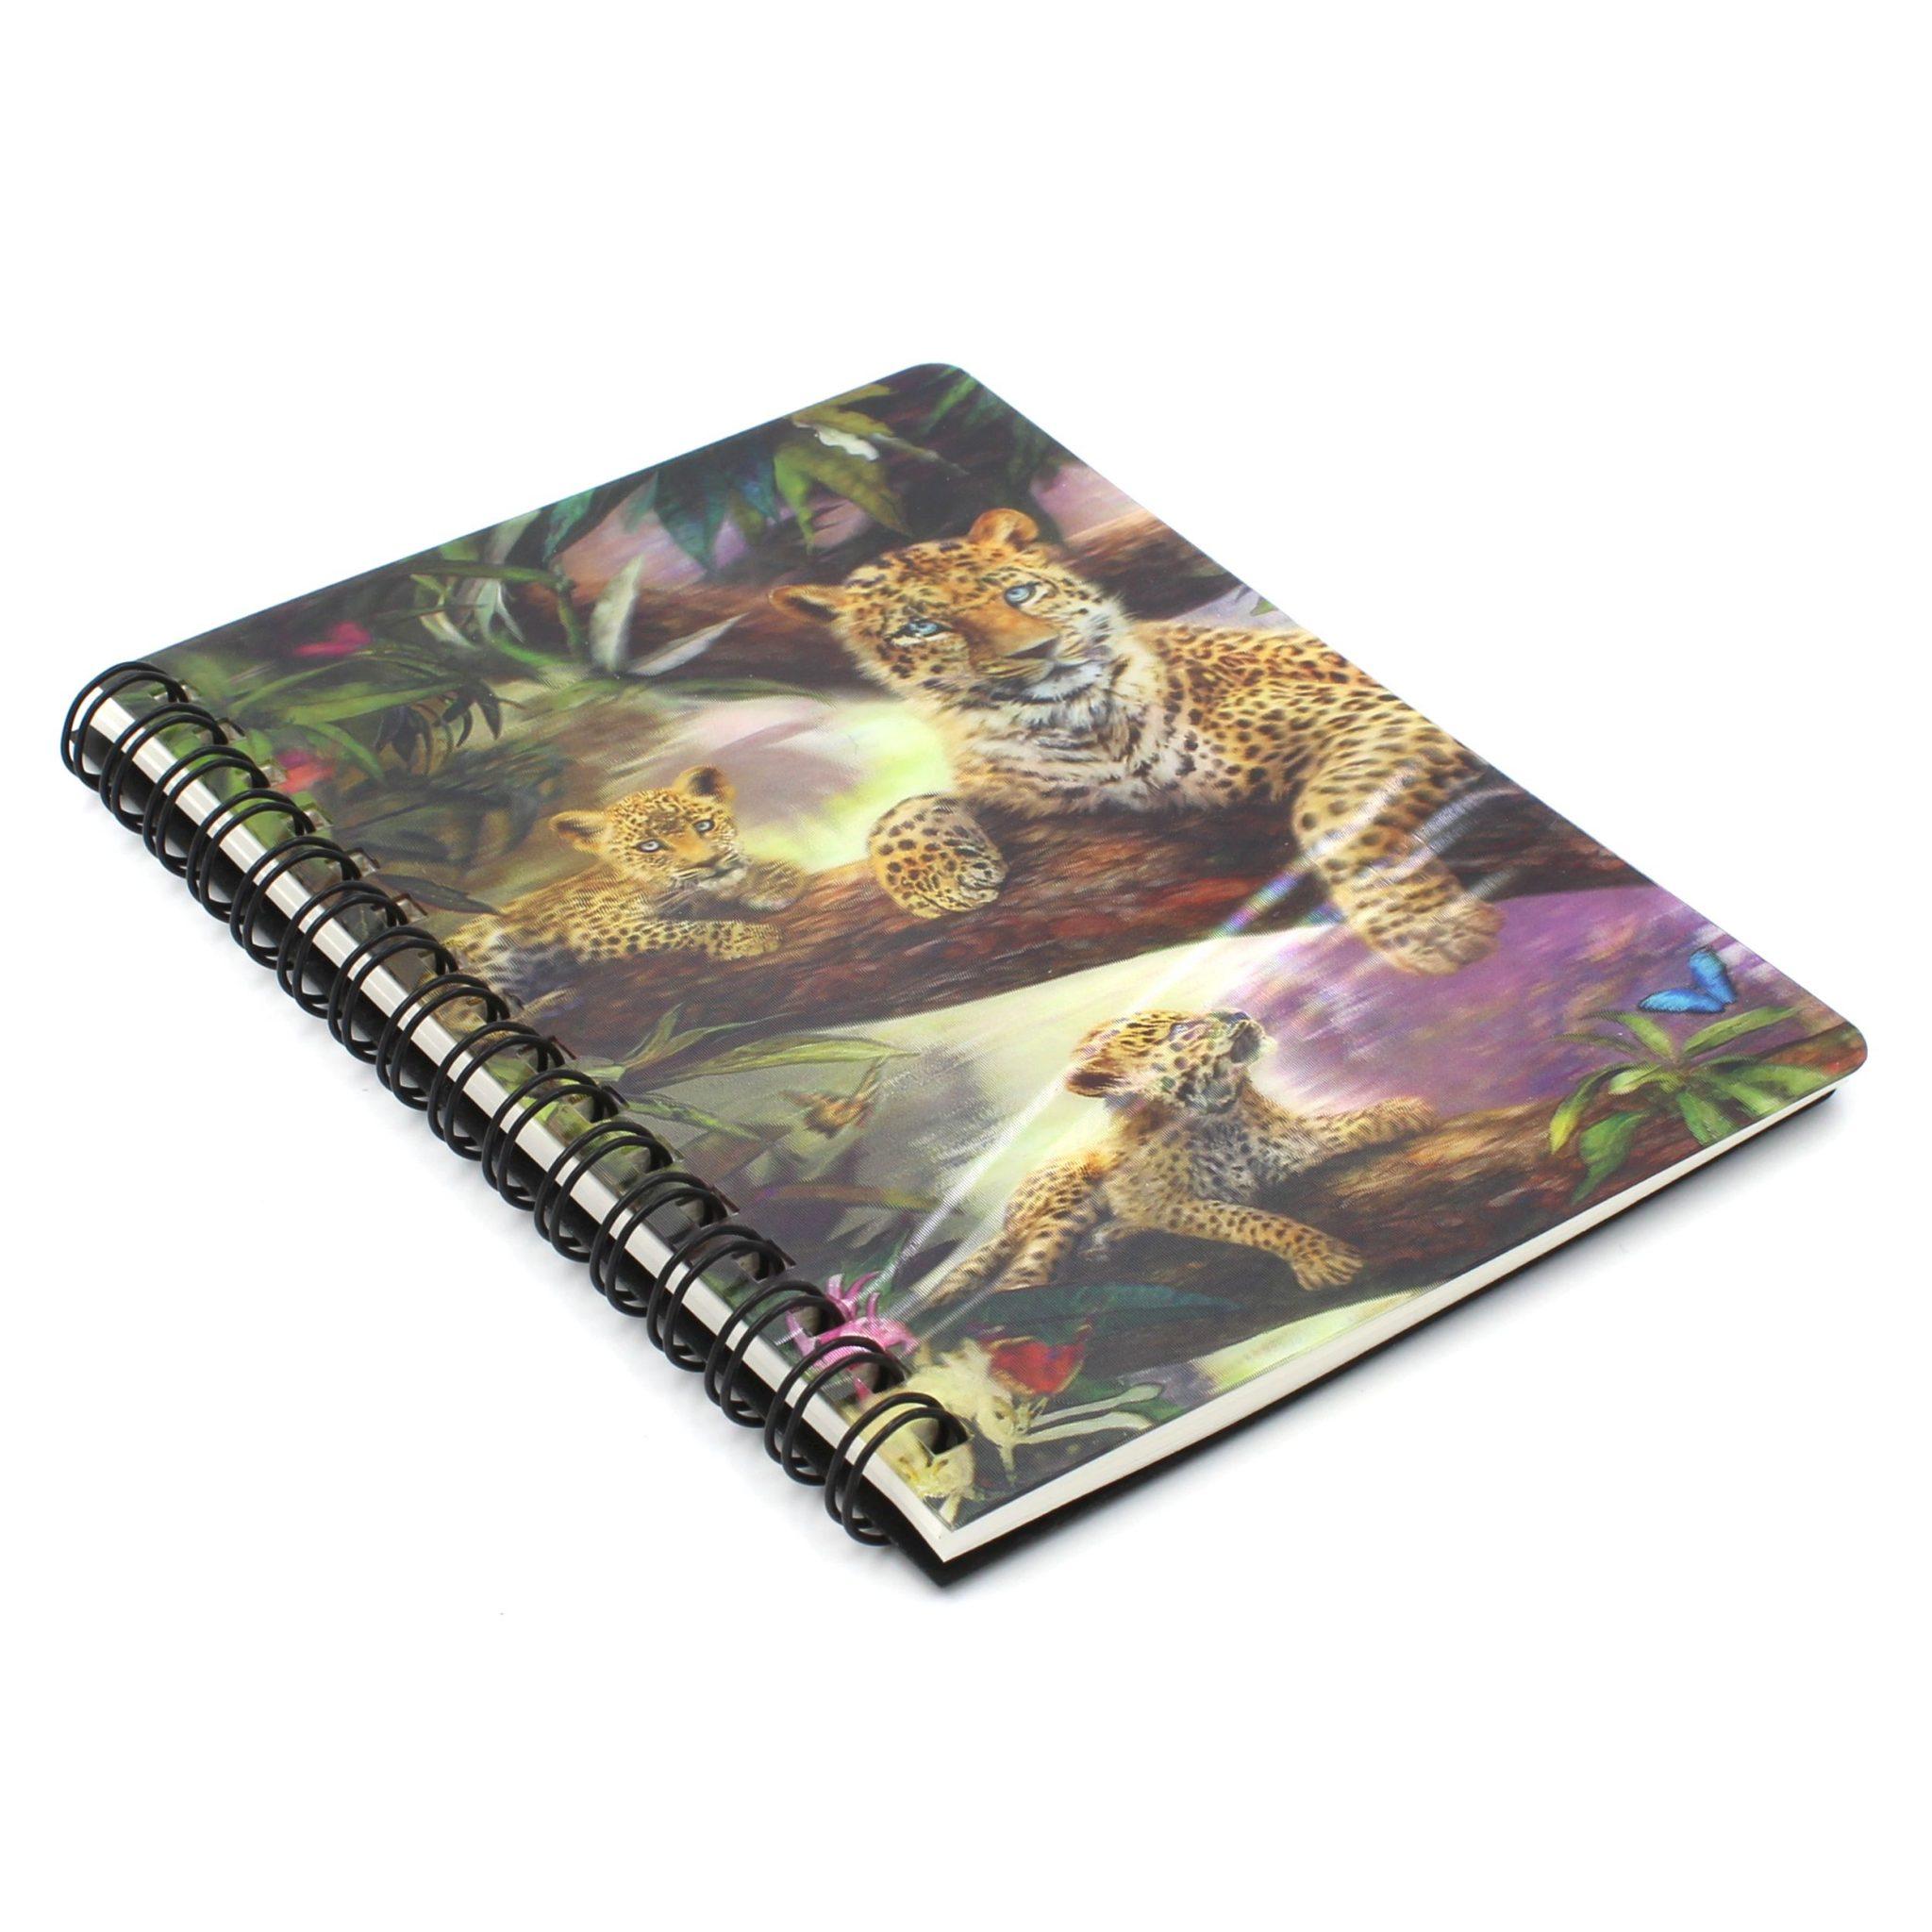 Carnetel zoo spirala 3D Treetop leopards